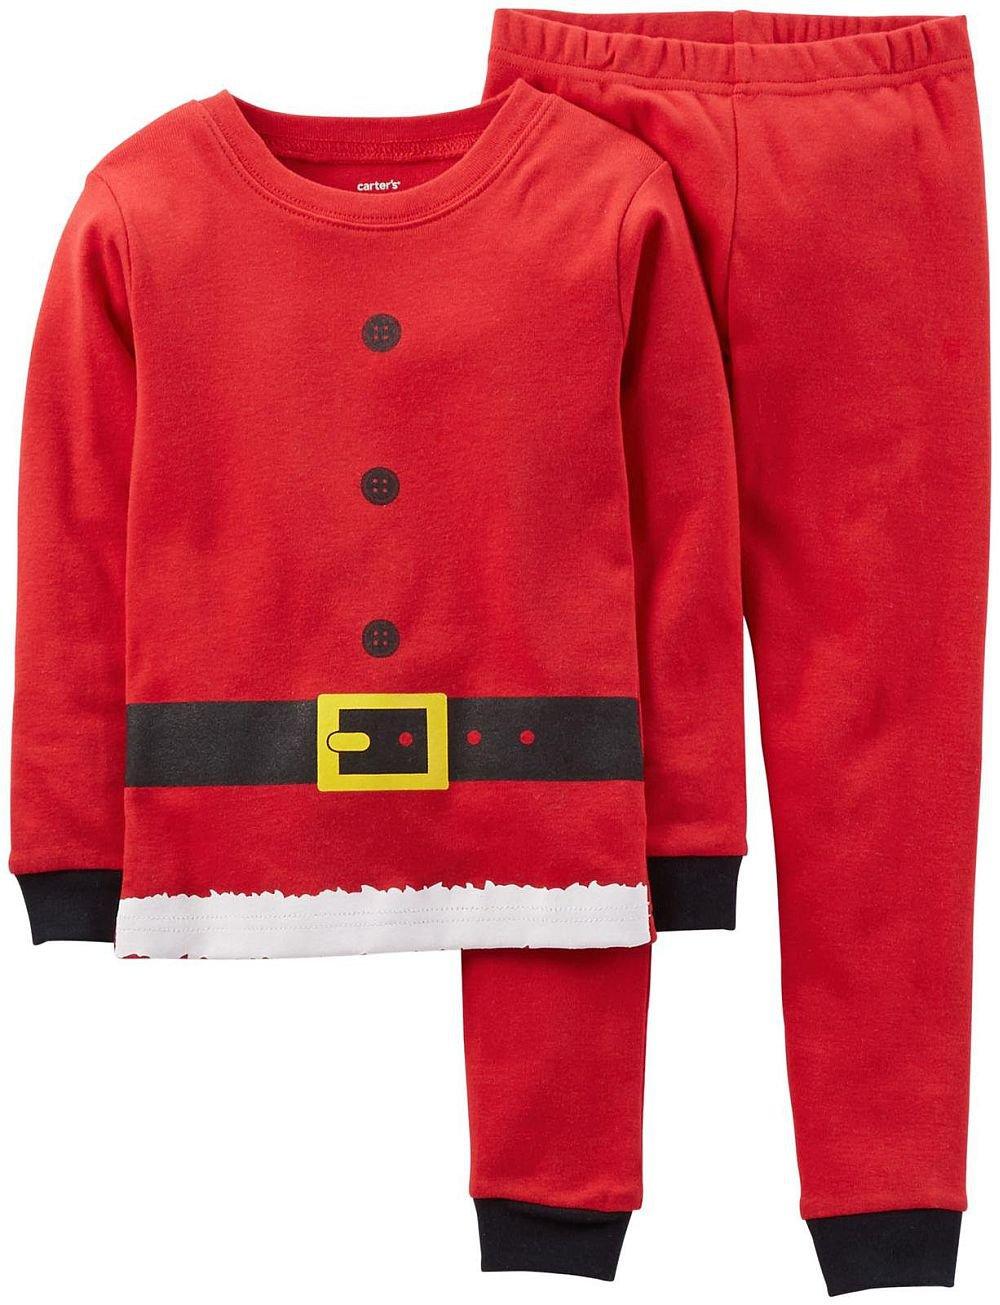 CARTER'S 4T CHRISTMAS Holiday SANTA Clause Suit Pajama Pants Set, NEW